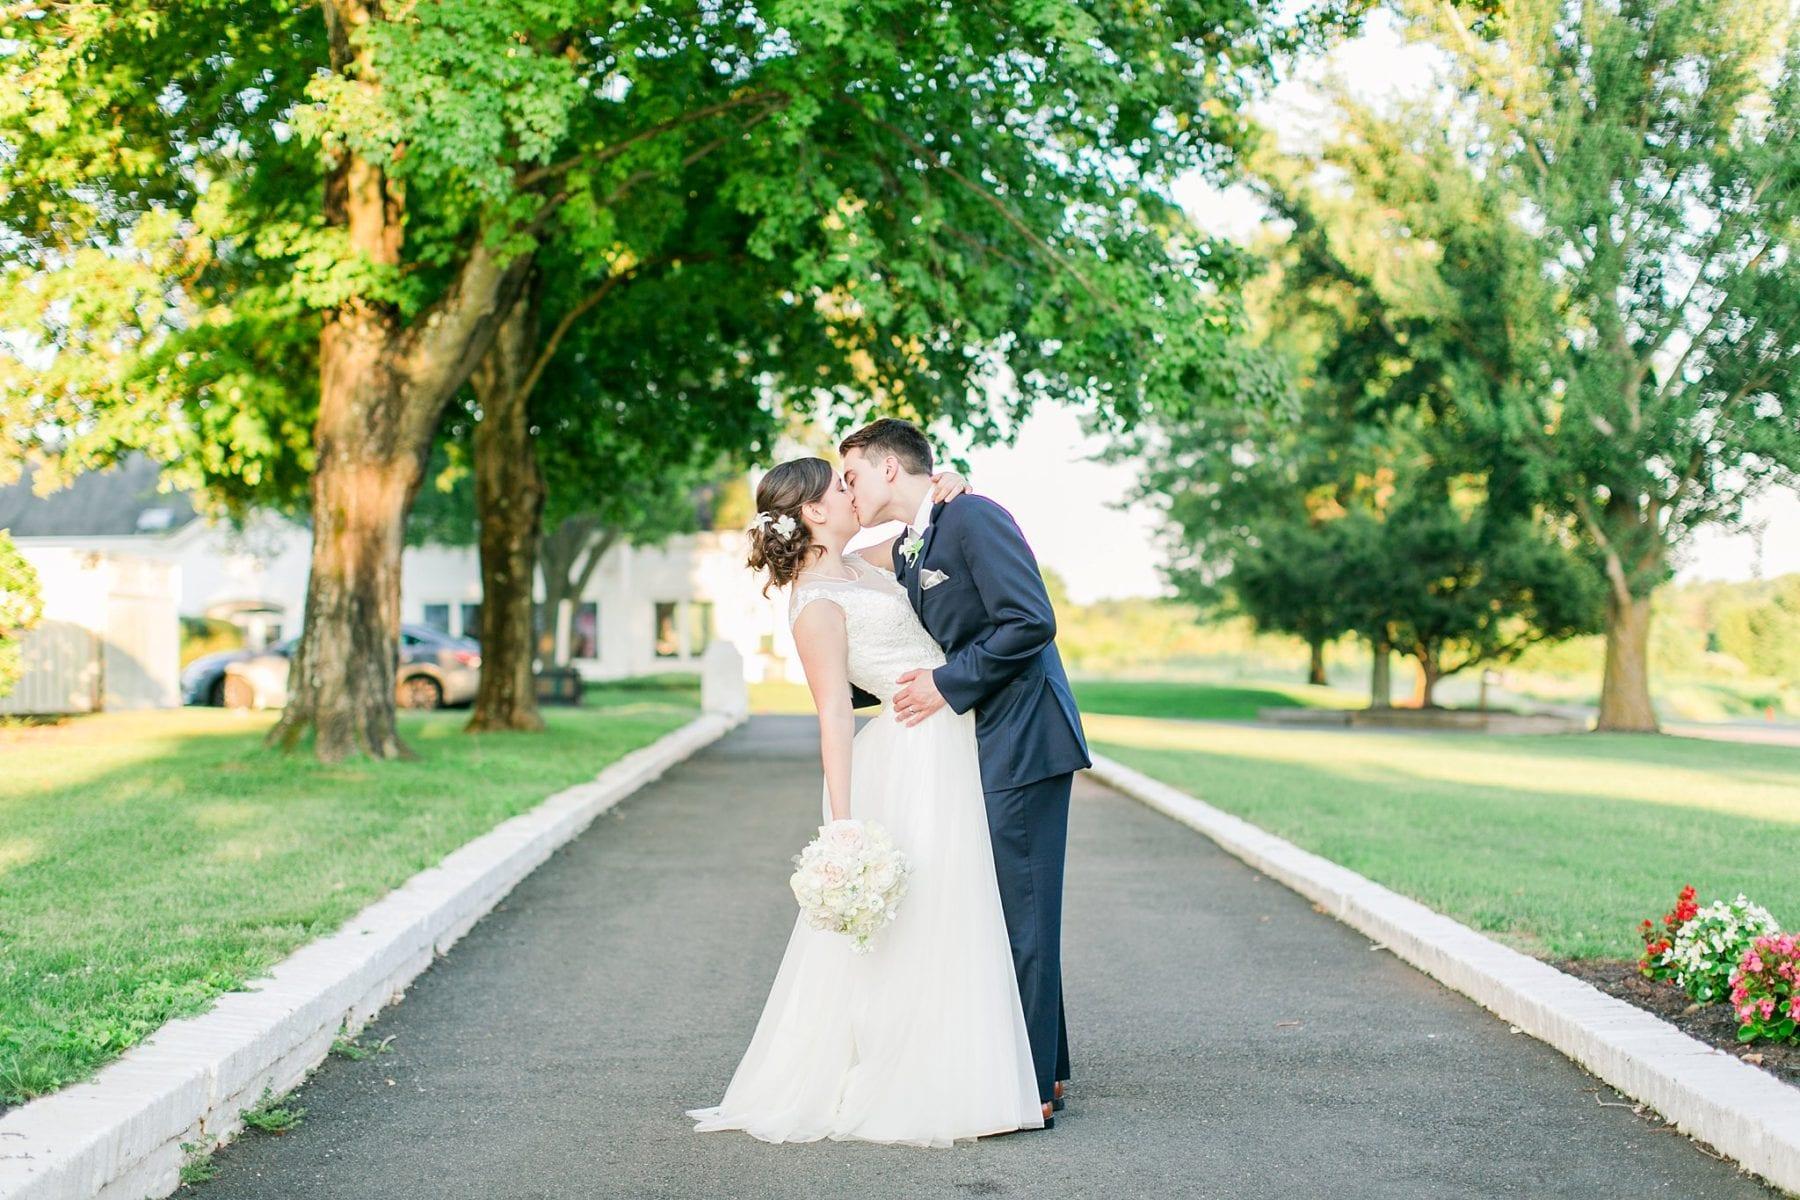 Bristow Manor Wedding Photos Virginia Wedding Photographer Lauren & Andrew Megan Kelsey Photography-533.jpg